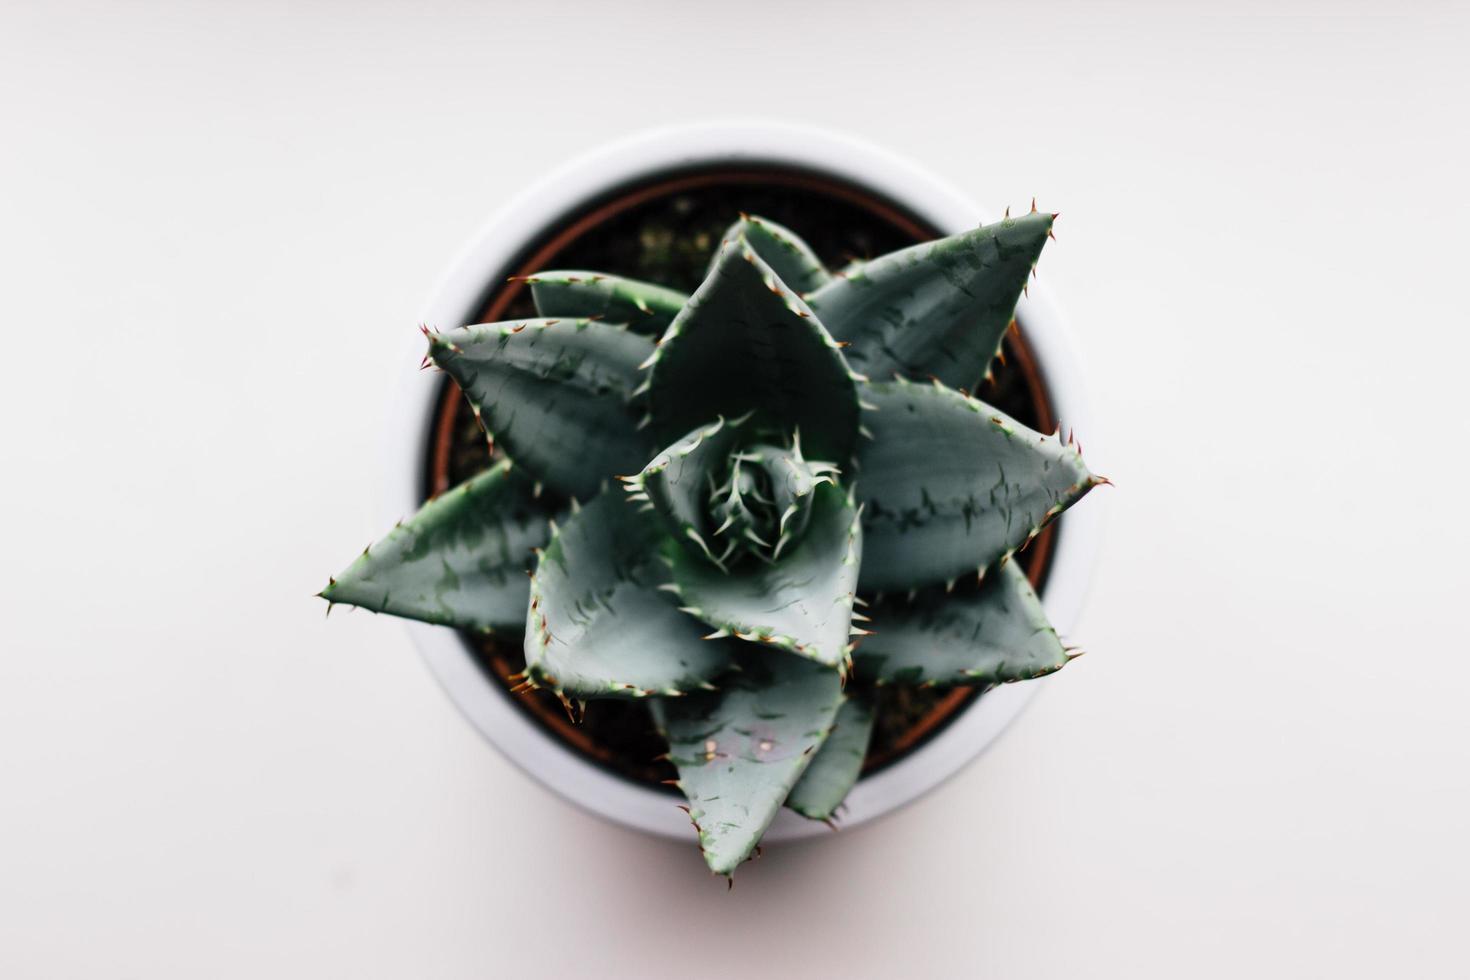 cactus verde su sfondo bianco foto